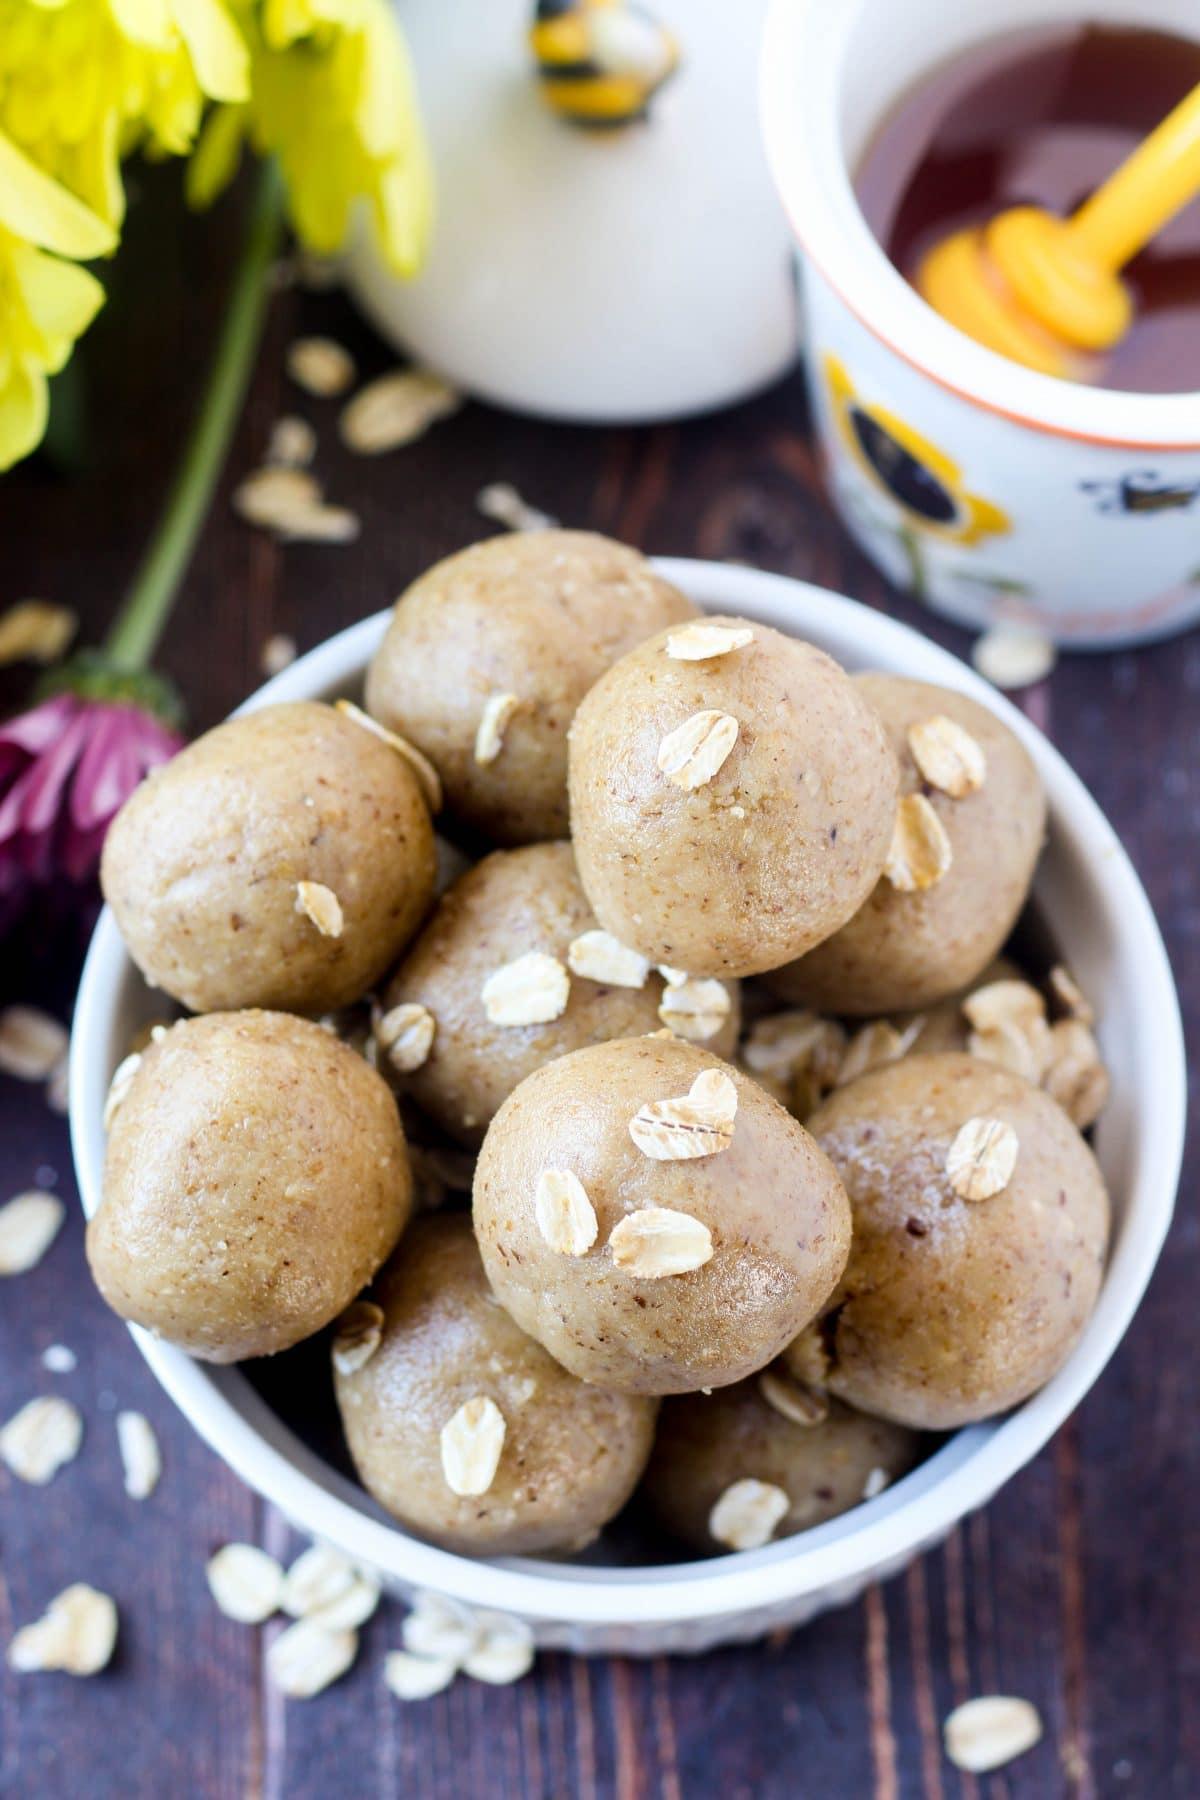 walnut-snack-balls-image